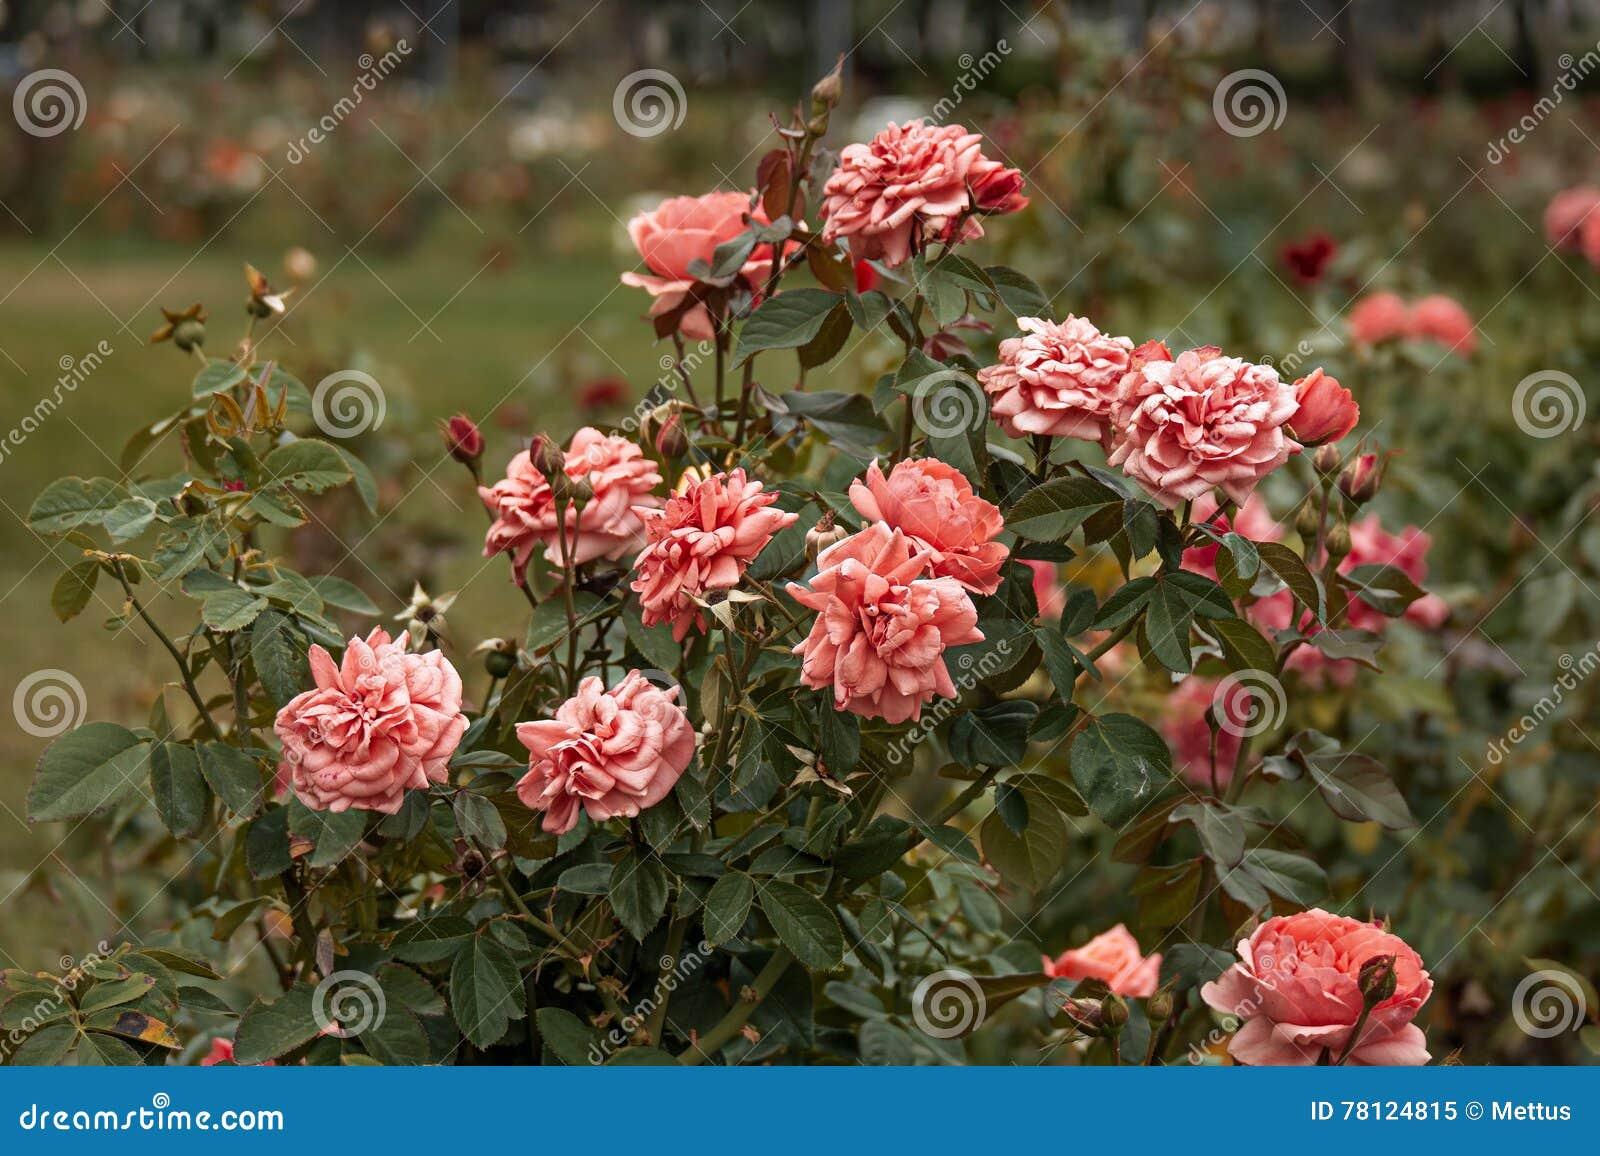 Garden Pink Roses Vintage Color Stock Image - Image of formal, macro ...